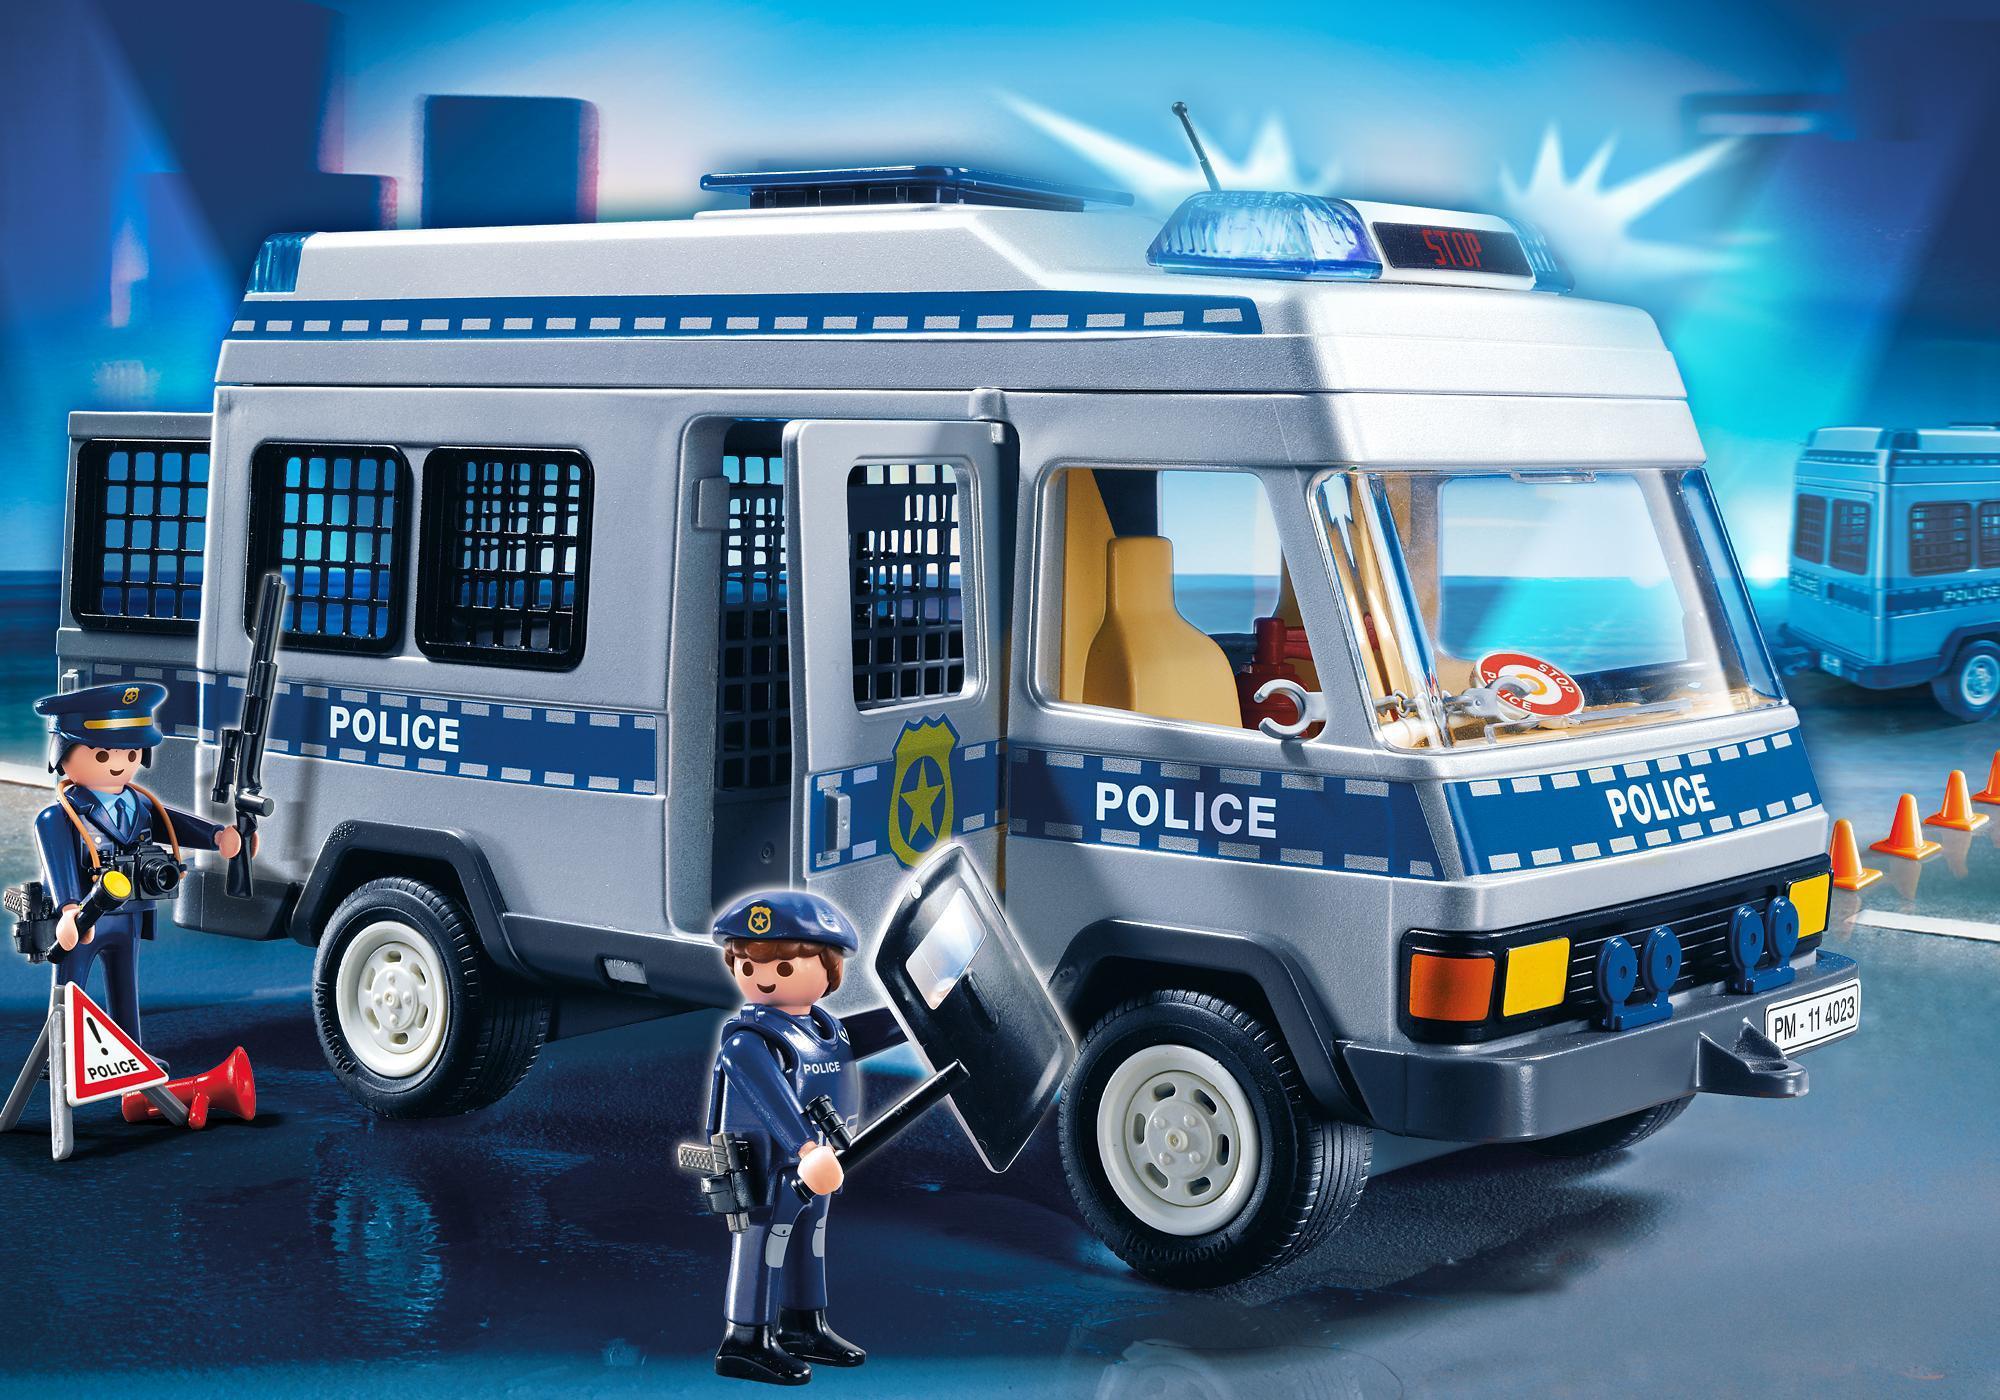 http://media.playmobil.com/i/playmobil/4023_product_detail/Mobiele politie eenheid